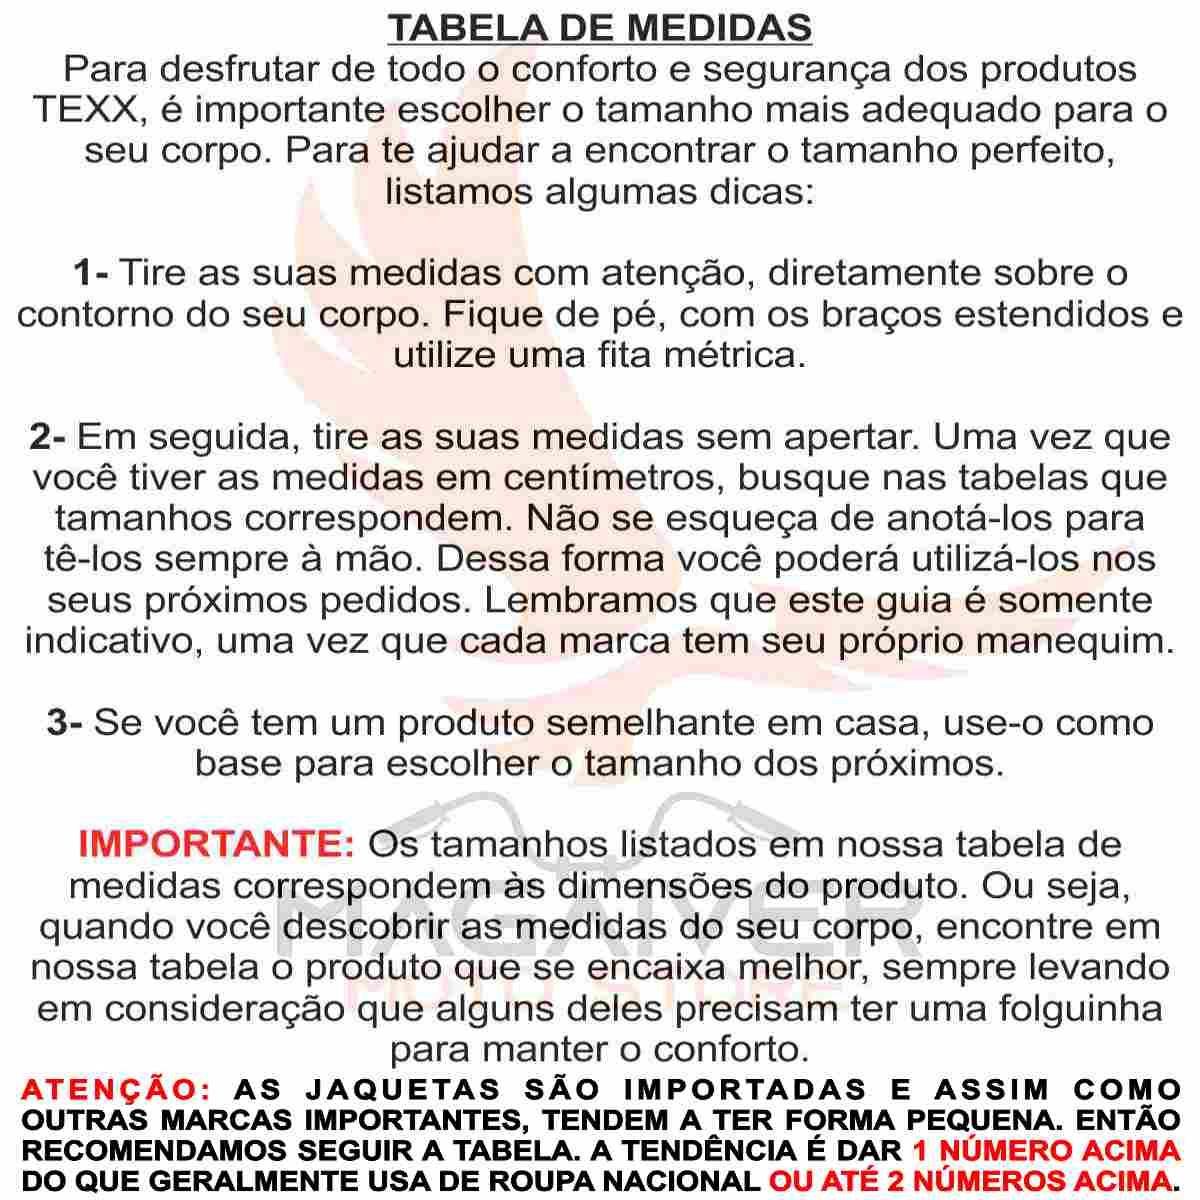 JAQUETA MOTOCICLISTA TEXX STRIKE SUMMER ( VERÃO ) II MASCULINO (OT-02)